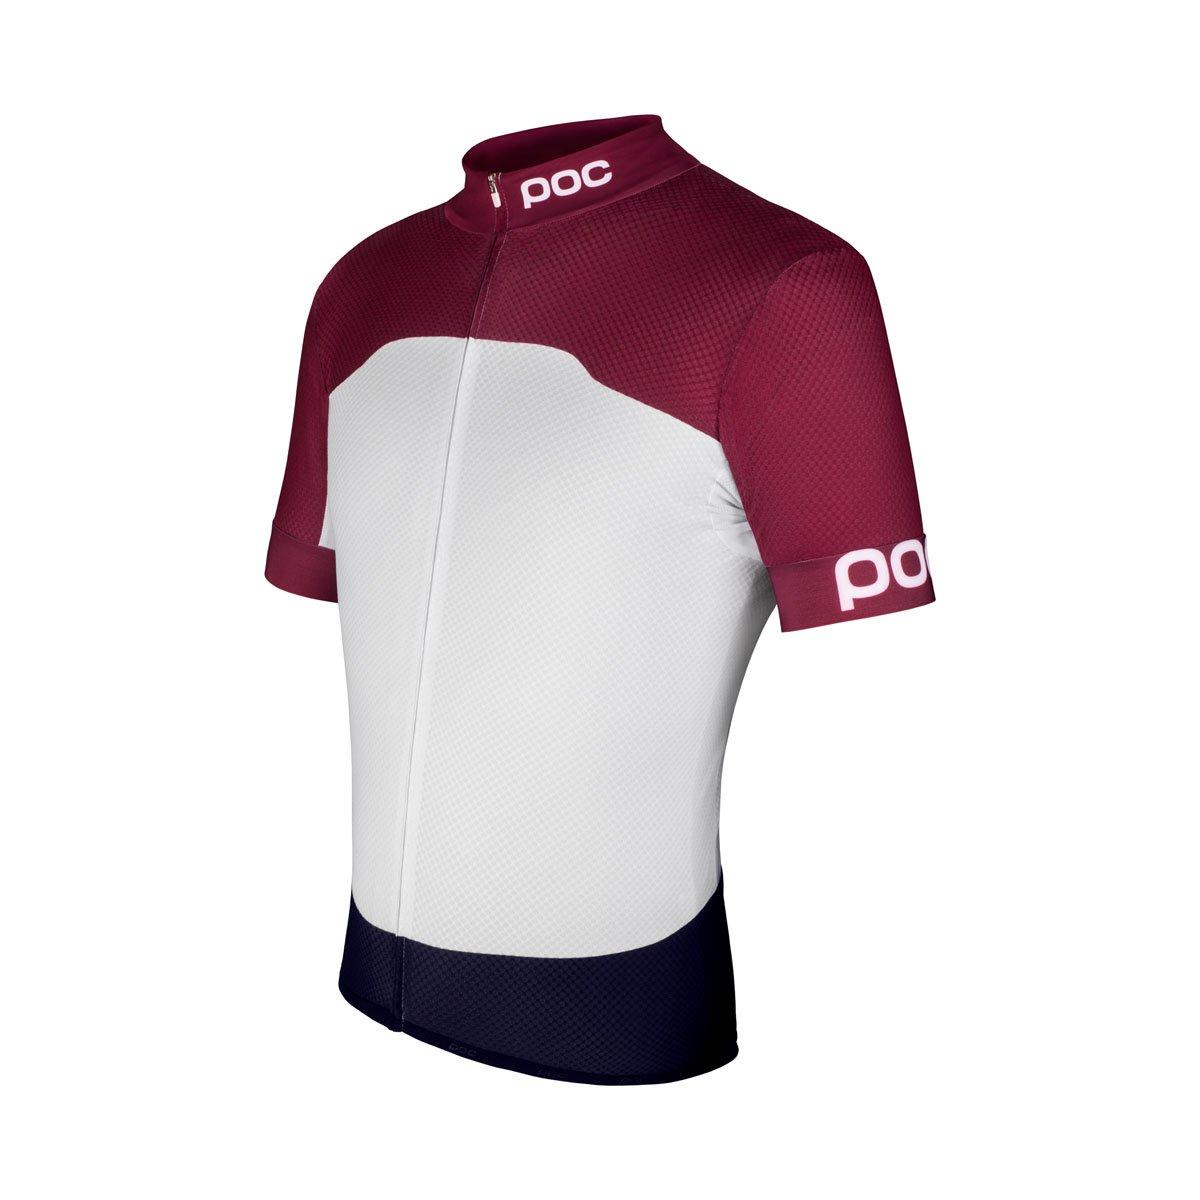 Mens PC5500080563XL1 POC Raceday Climber Jersey